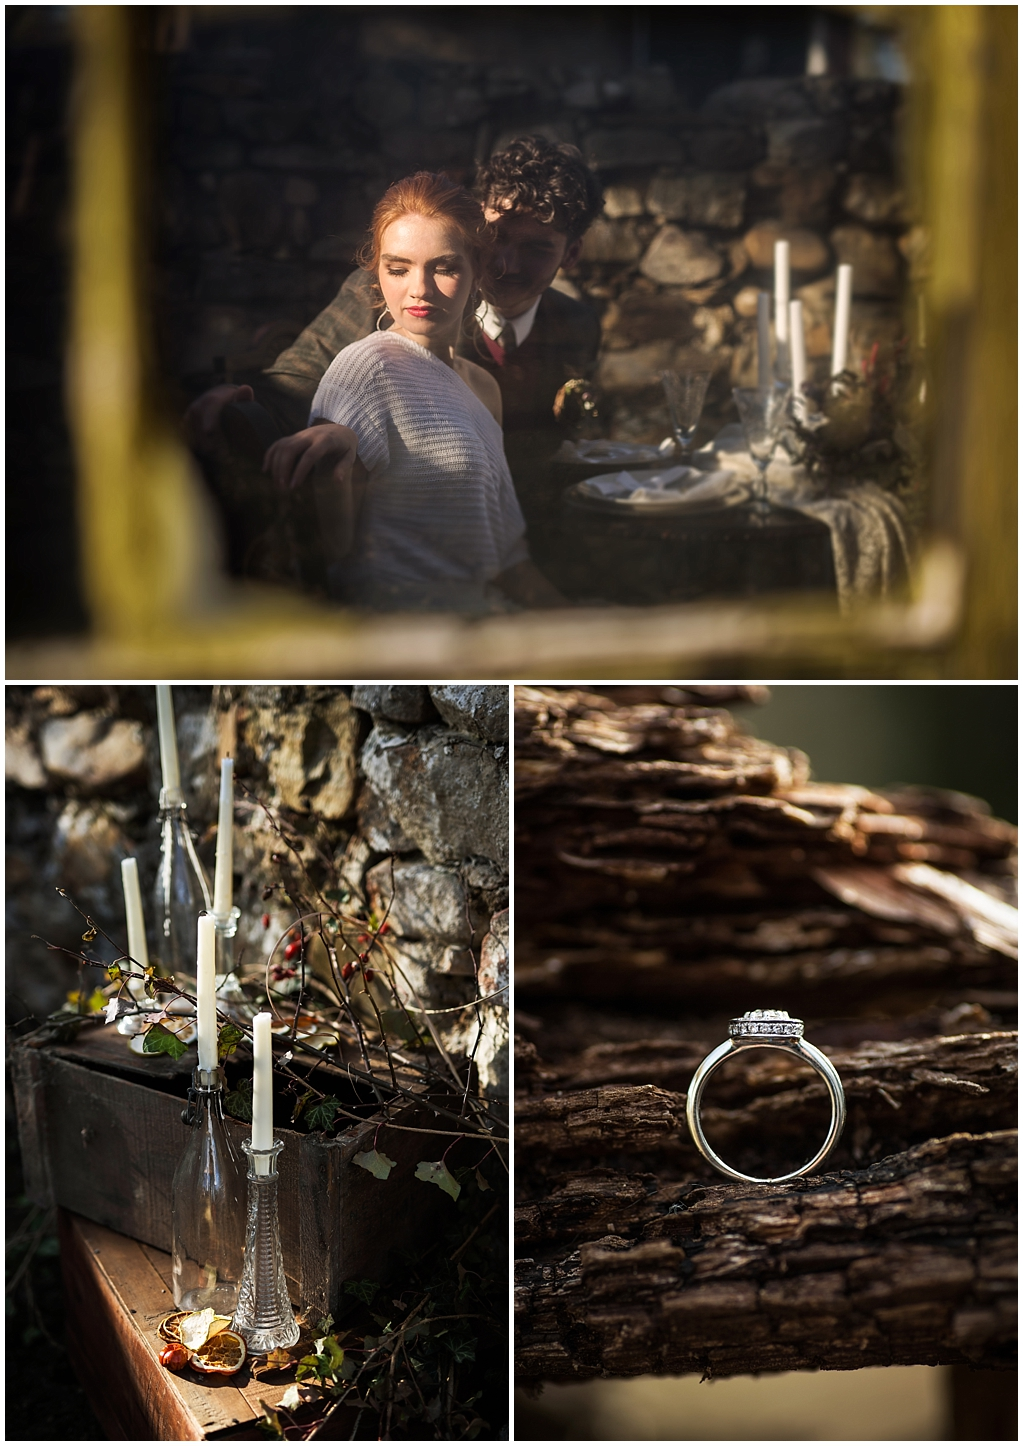 2018-02-08_0022.jpgwinter wedding styled photoshoot pittsburgh pennsylvania look twothrough window